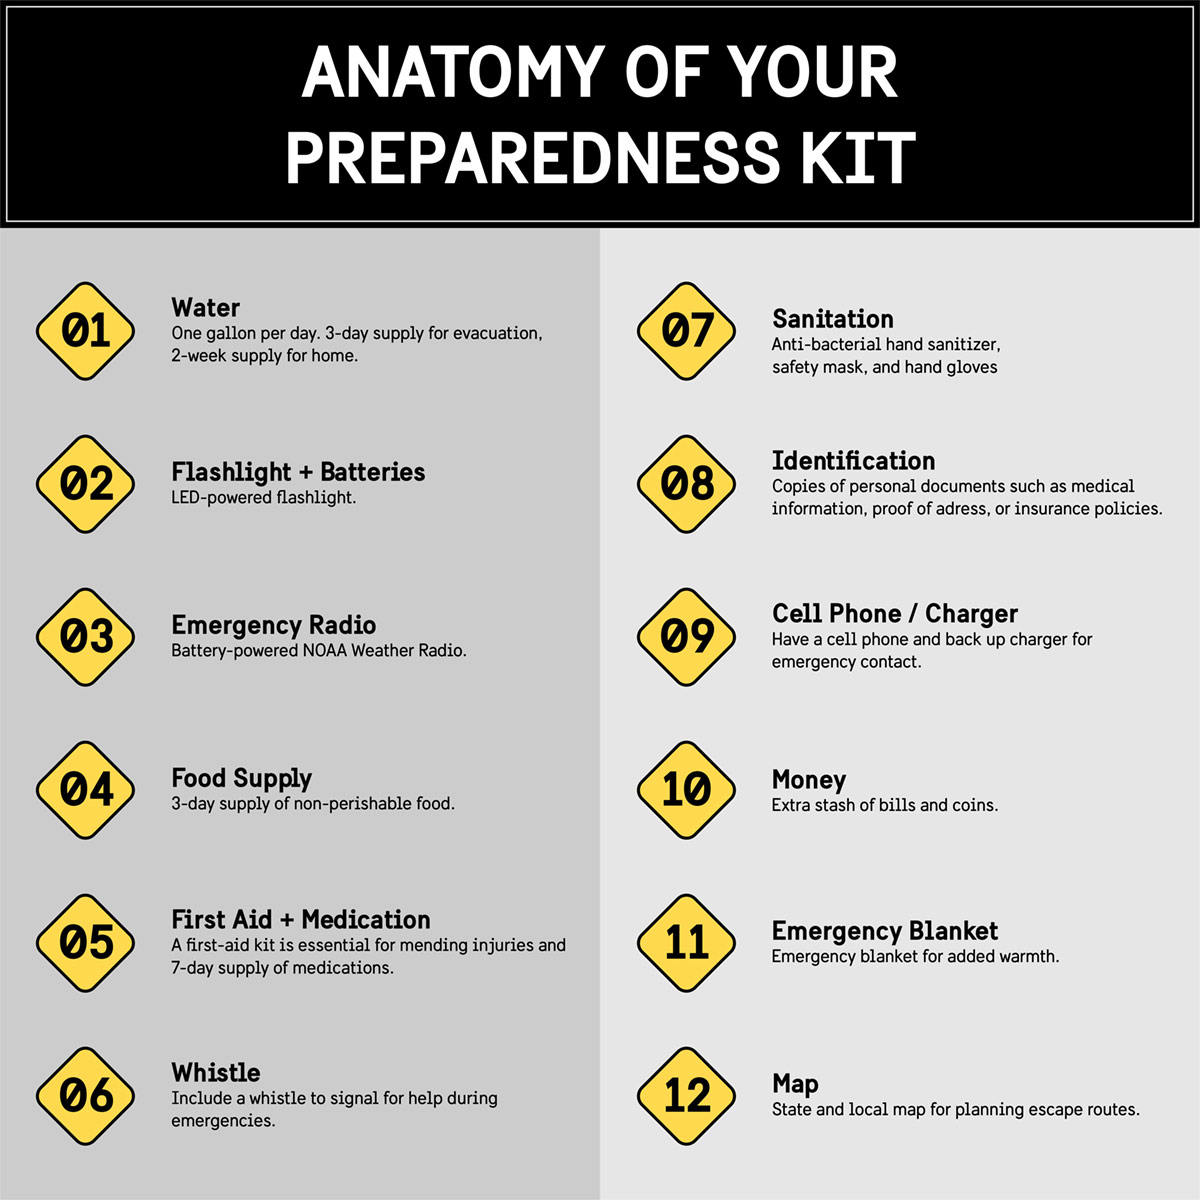 pelican professional blog anatomy of preparedness kit lit